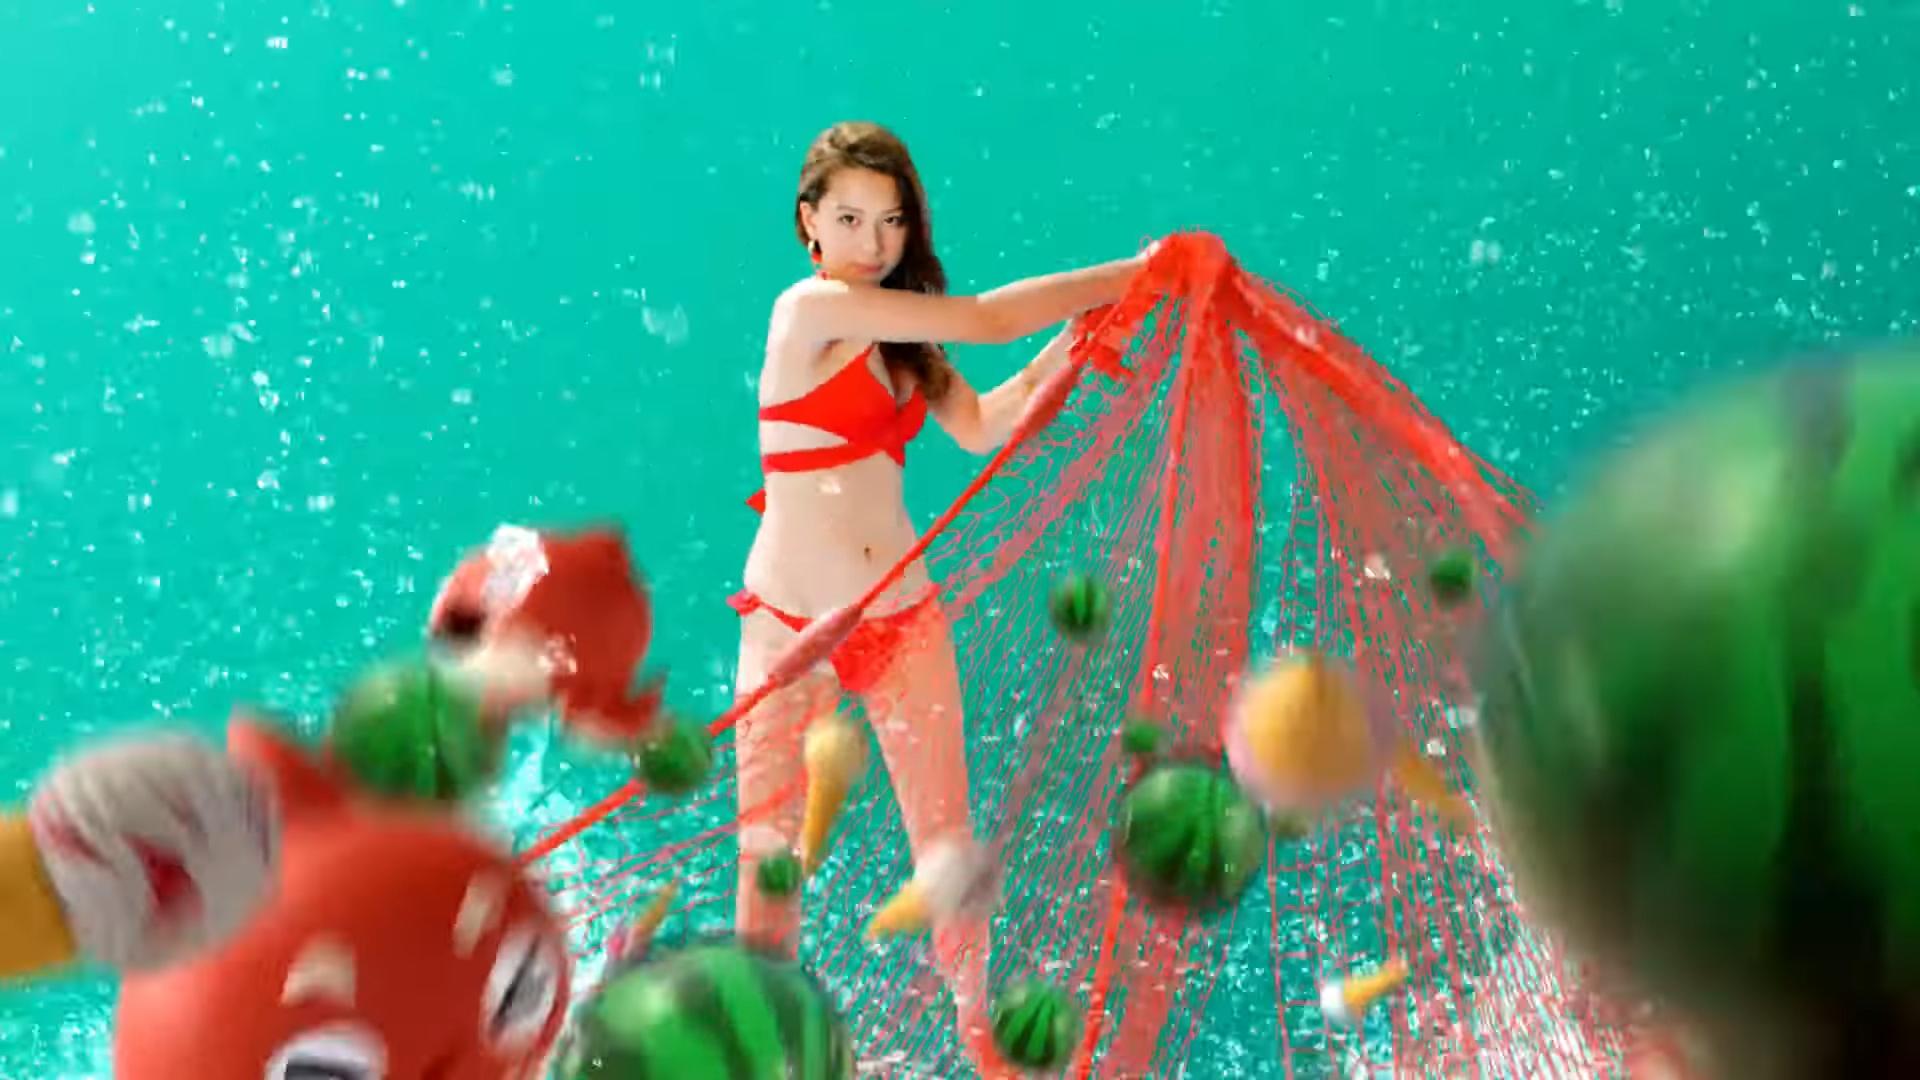 Niki(丹羽仁希)のヌード・水着グラビア等抜けるエロ画像110枚・50枚目の画像